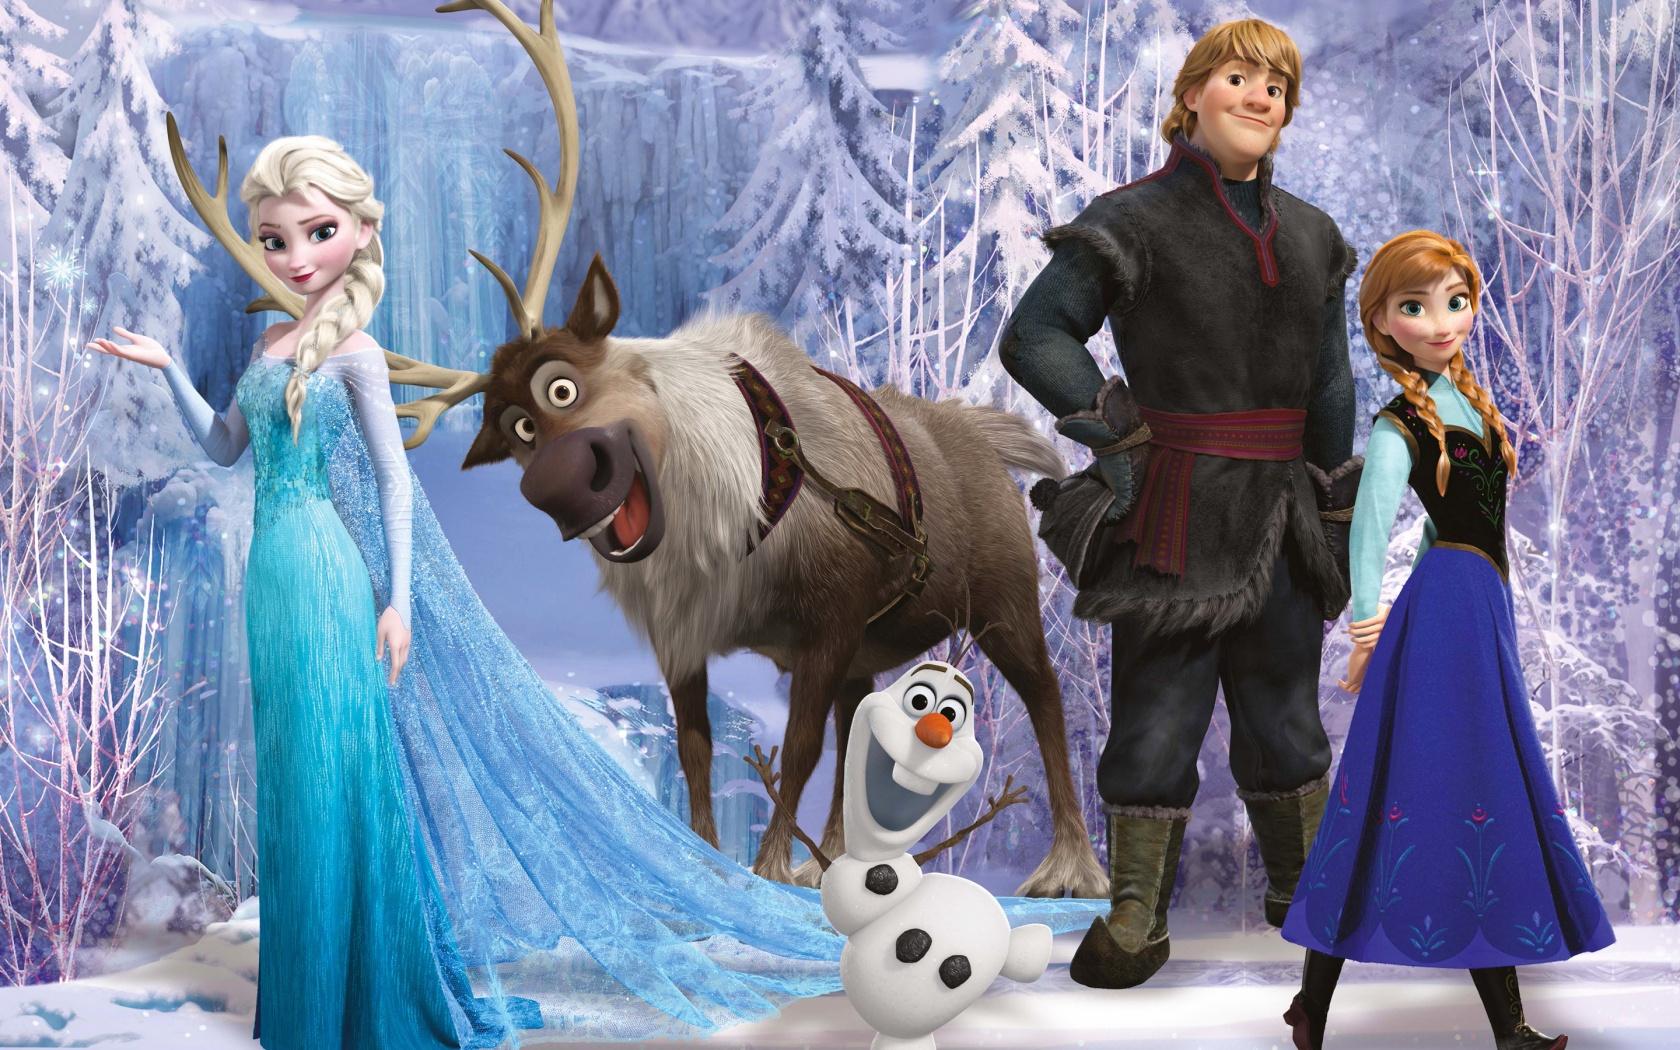 Frozen Movie 2014 Wallpapers HD Wallpapers 1680x1050